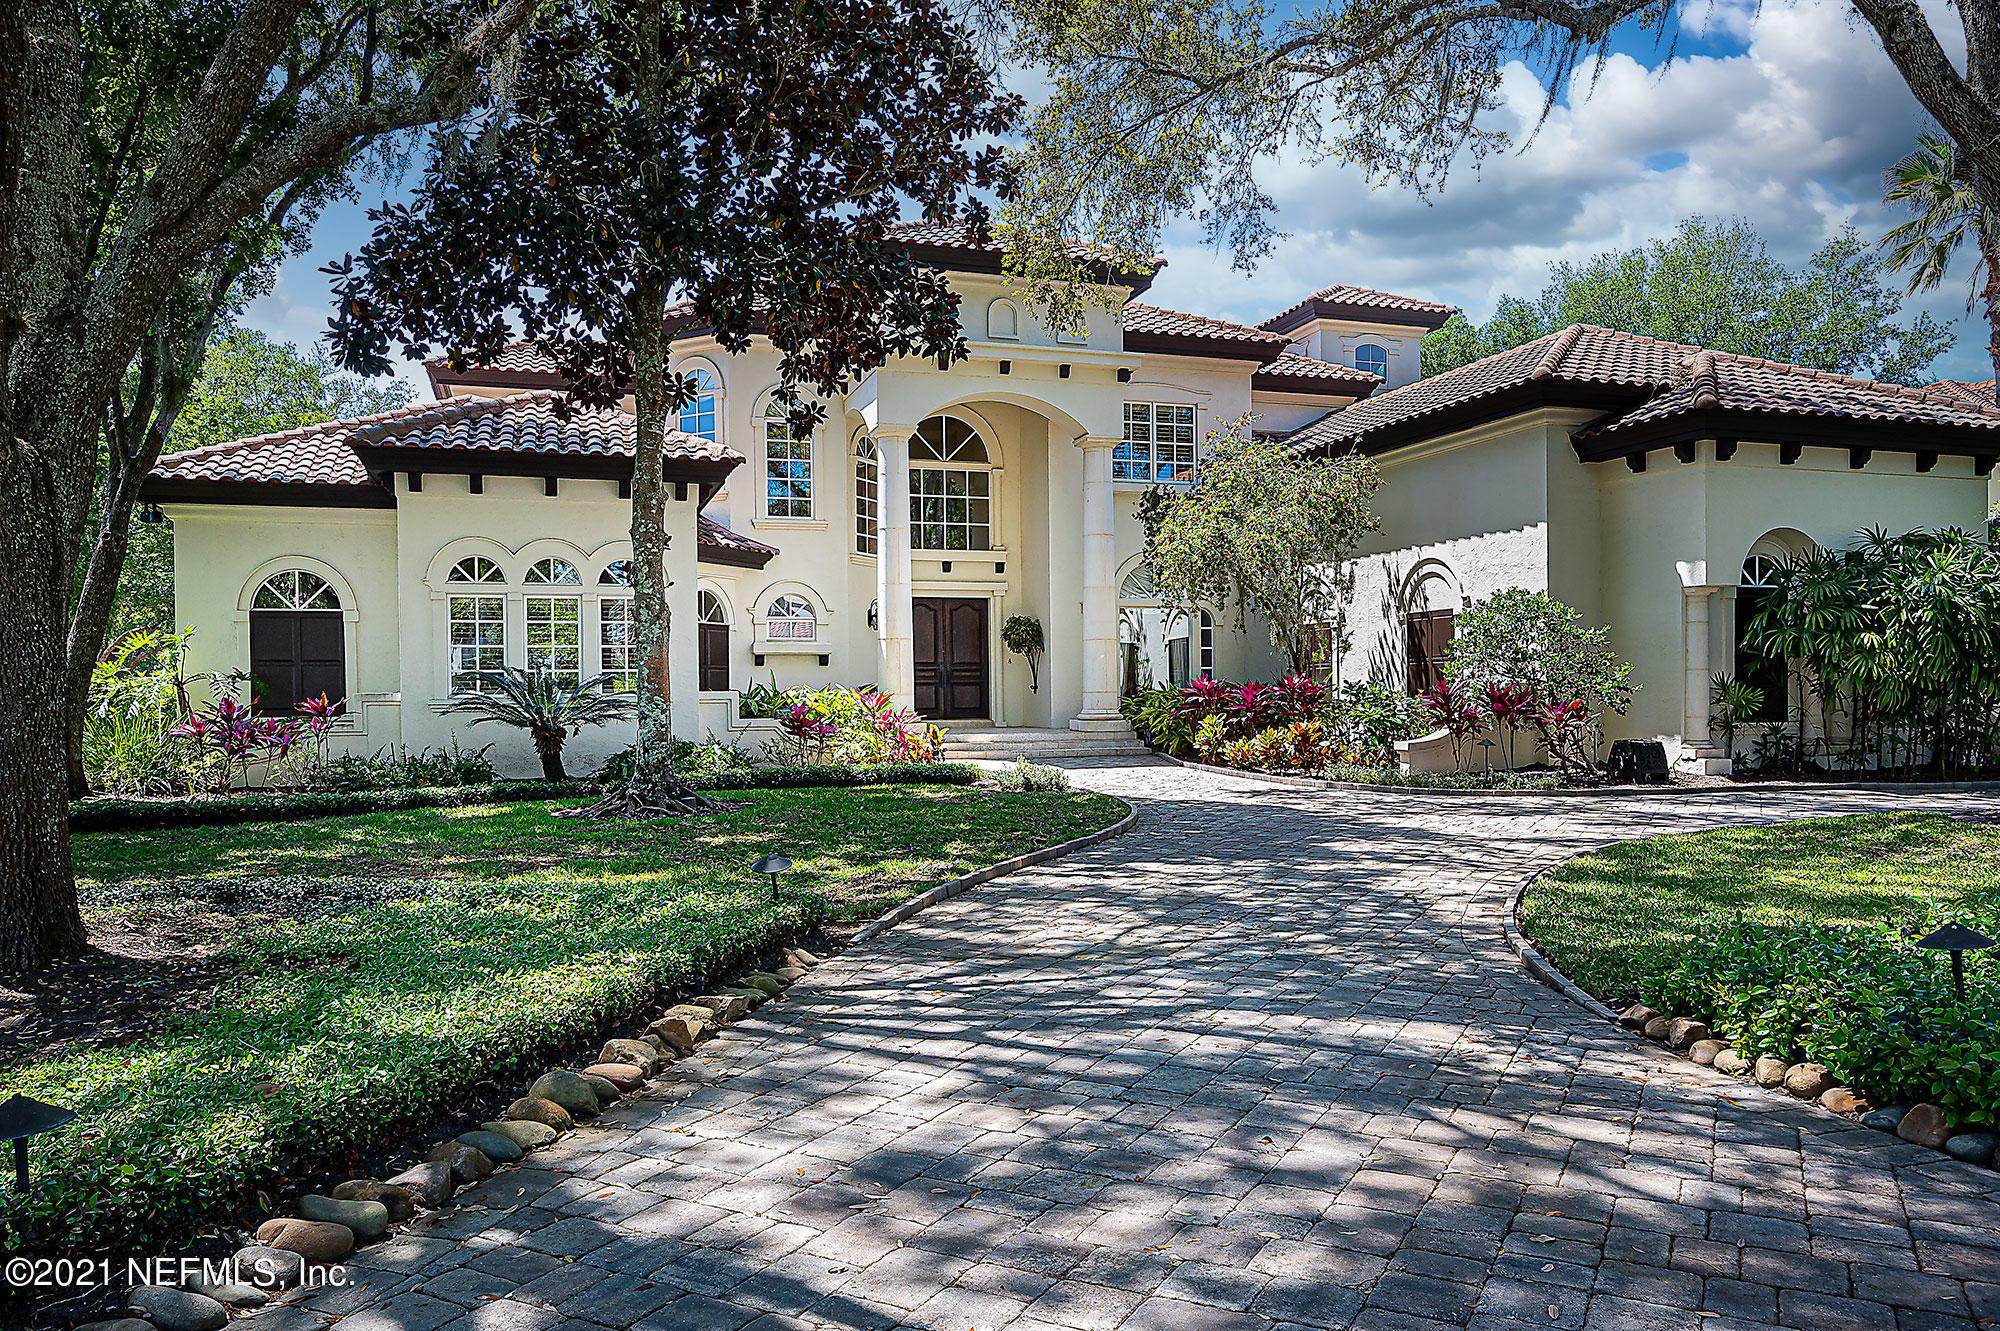 24625 HARBOUR VIEW, PONTE VEDRA BEACH, FLORIDA 32082, 5 Bedrooms Bedrooms, ,6 BathroomsBathrooms,Residential,For sale,HARBOUR VIEW,1098646